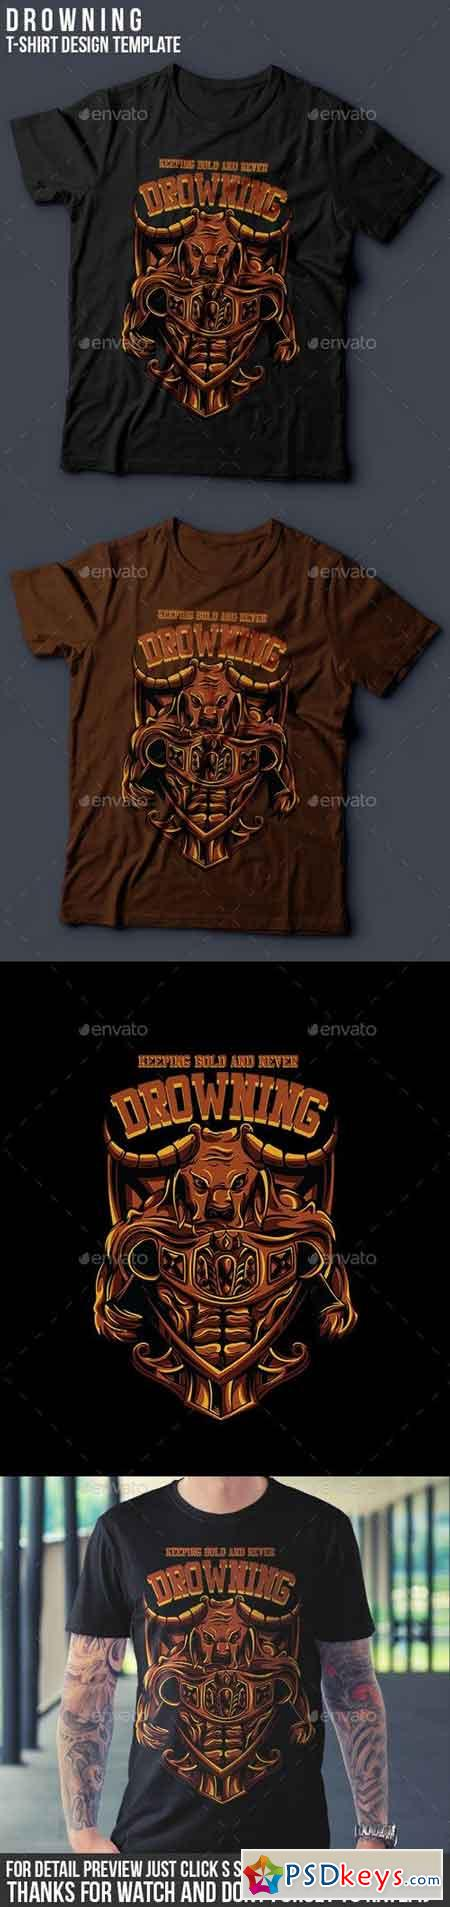 Drowning T-Shirt Design 14481002